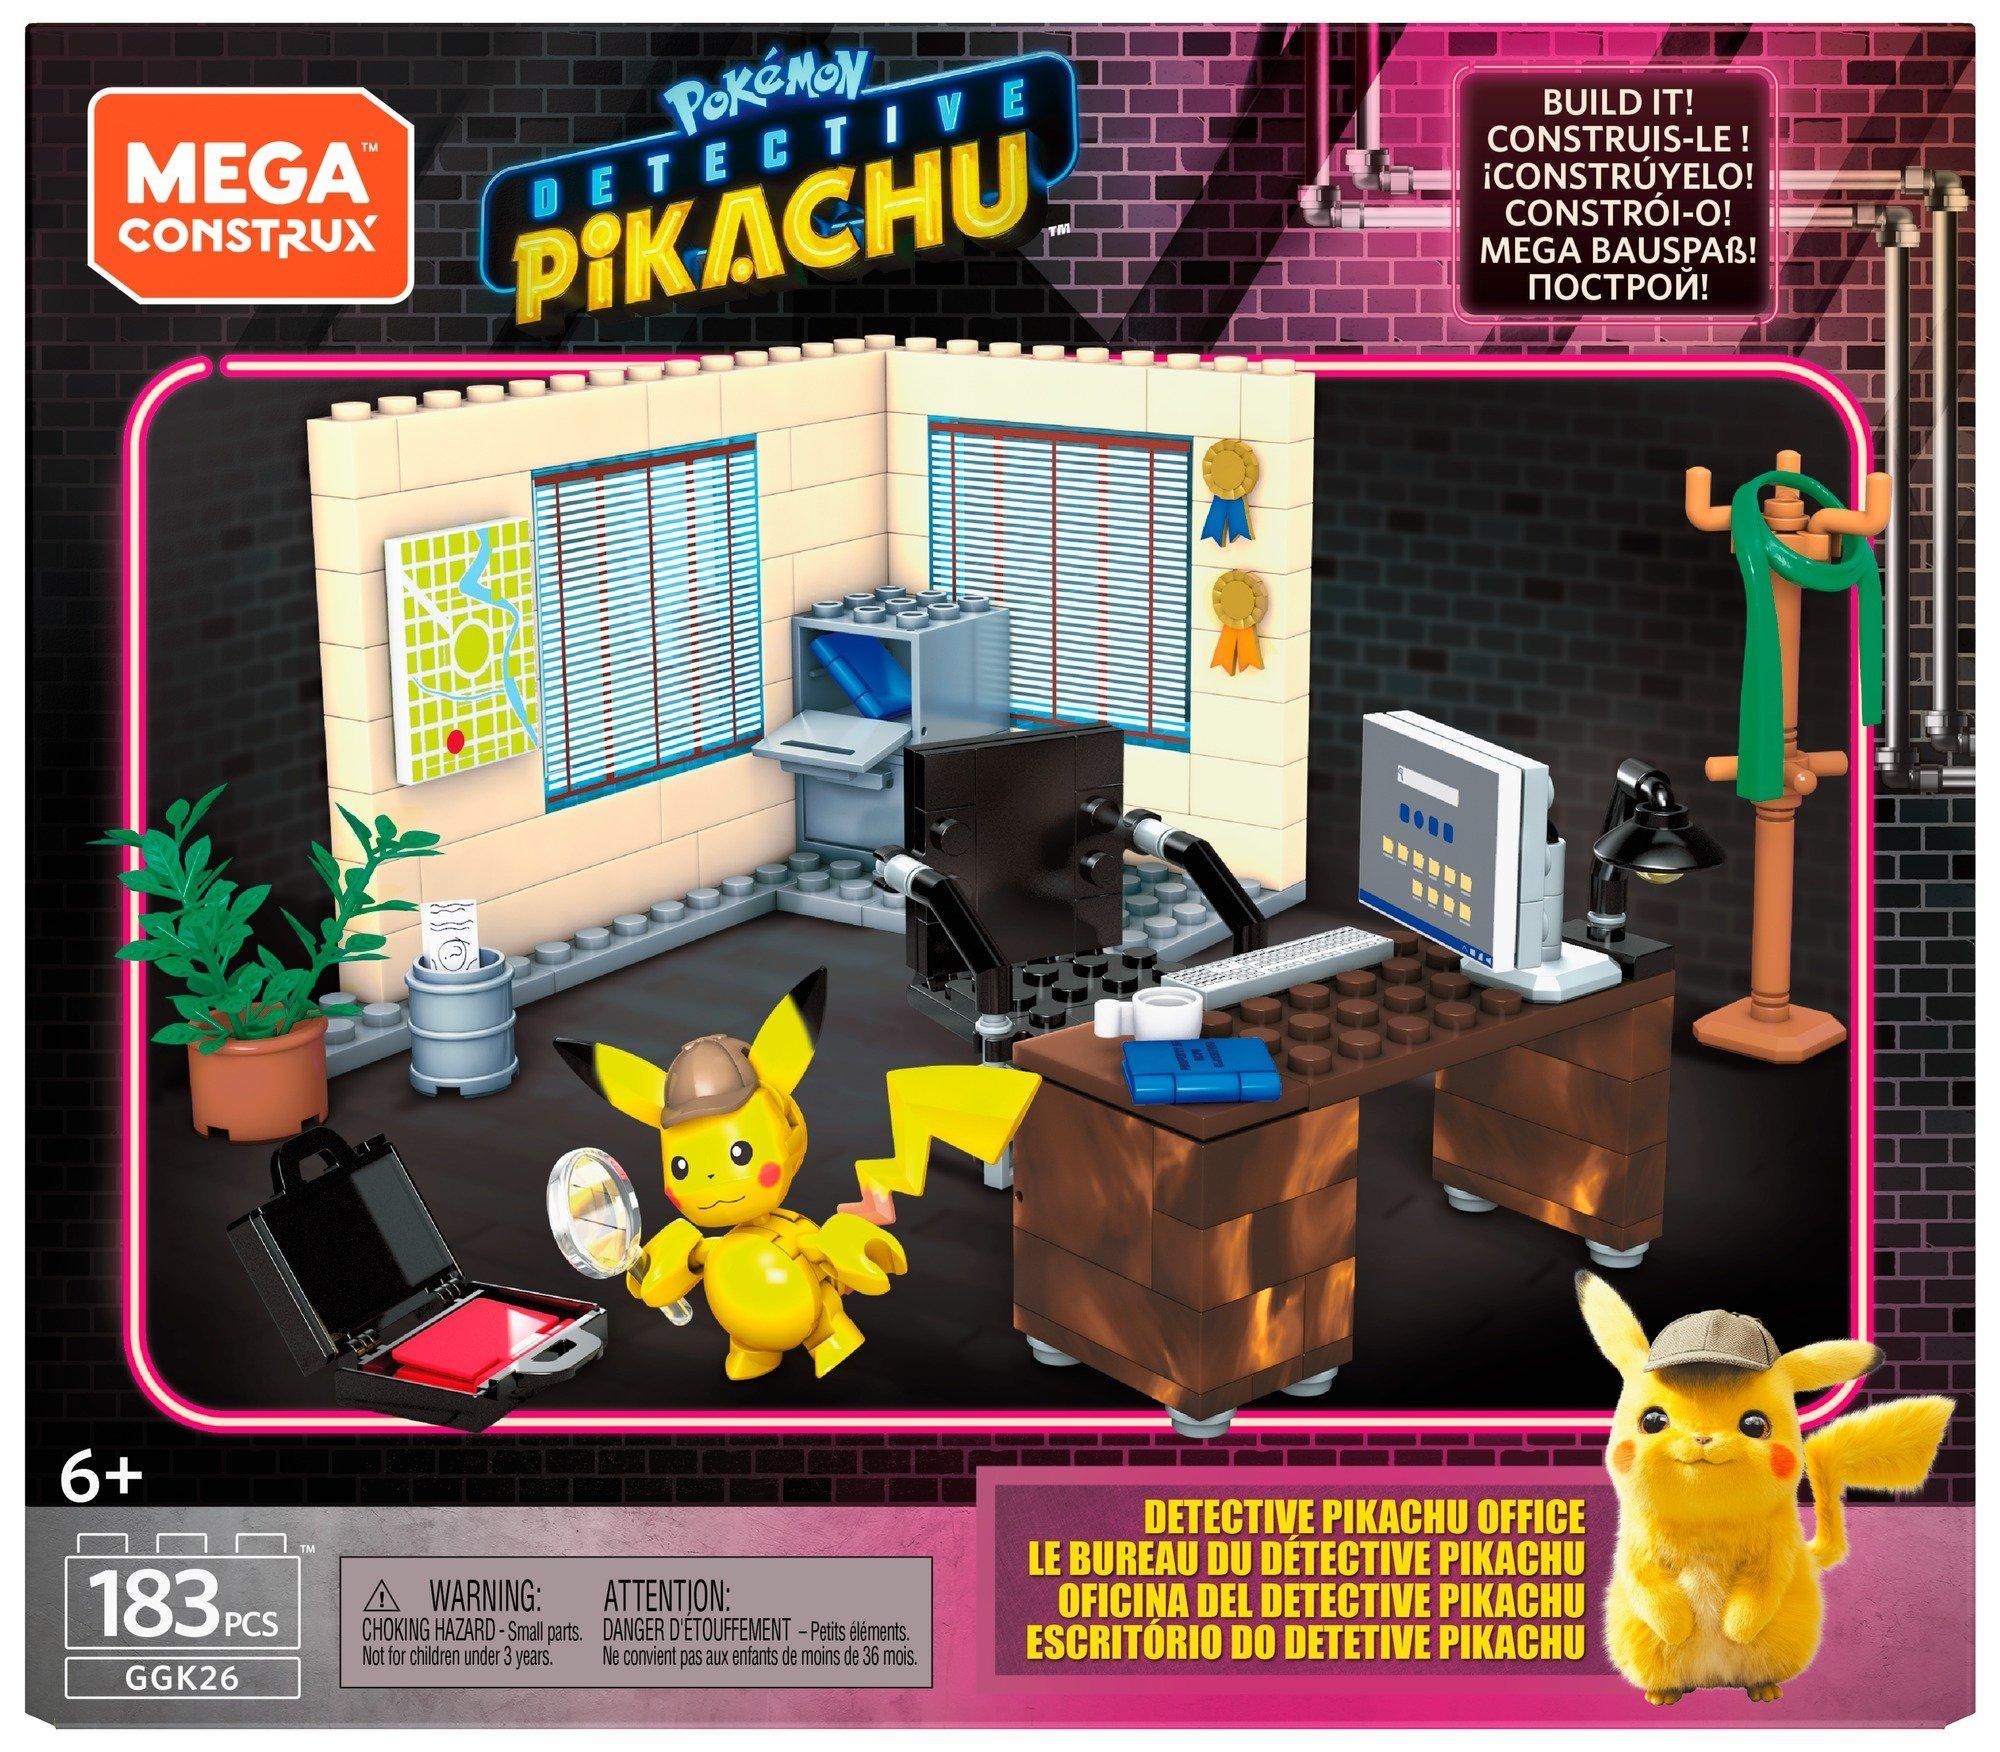 Pokemon Detective Pikachu Office Mega Construx Gamestop